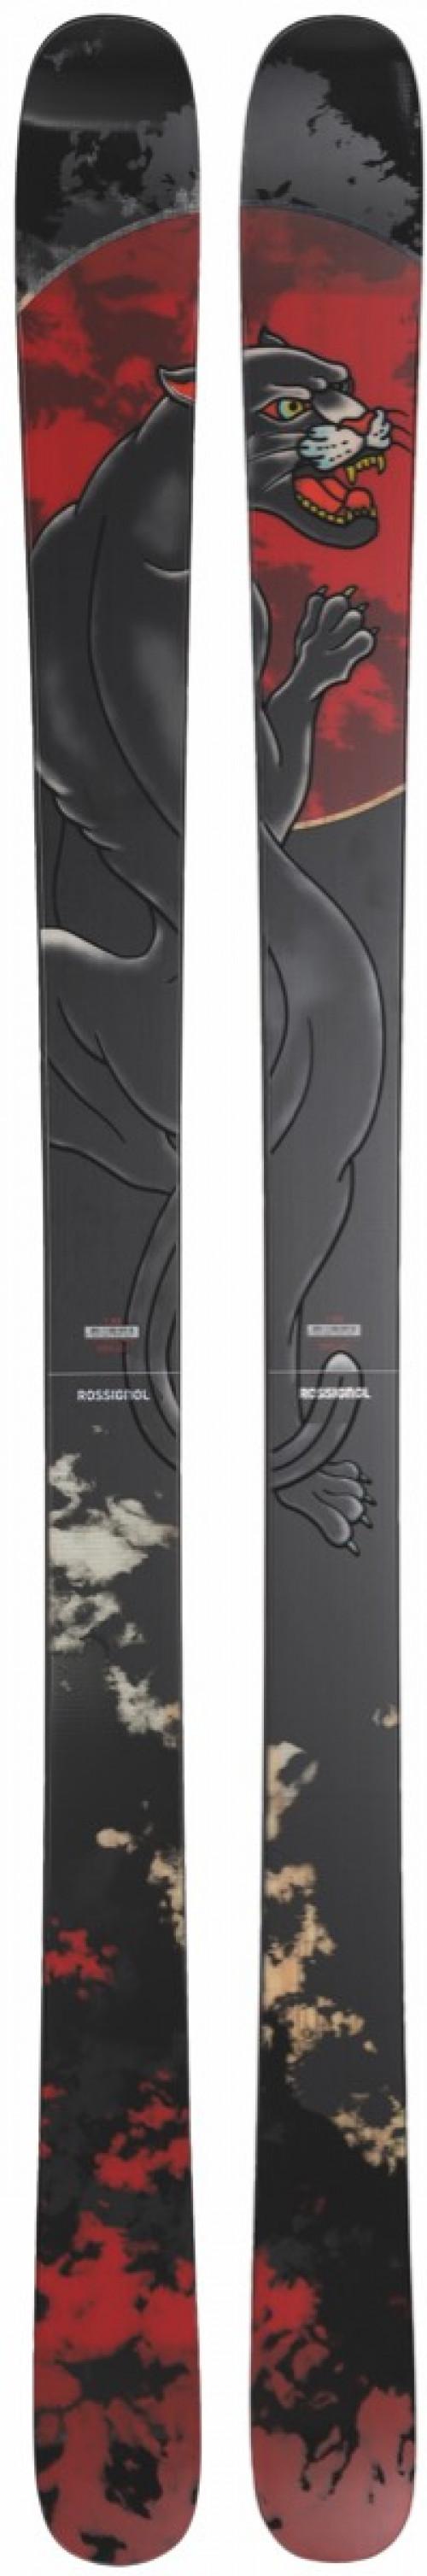 Rossignol Black Ops 98